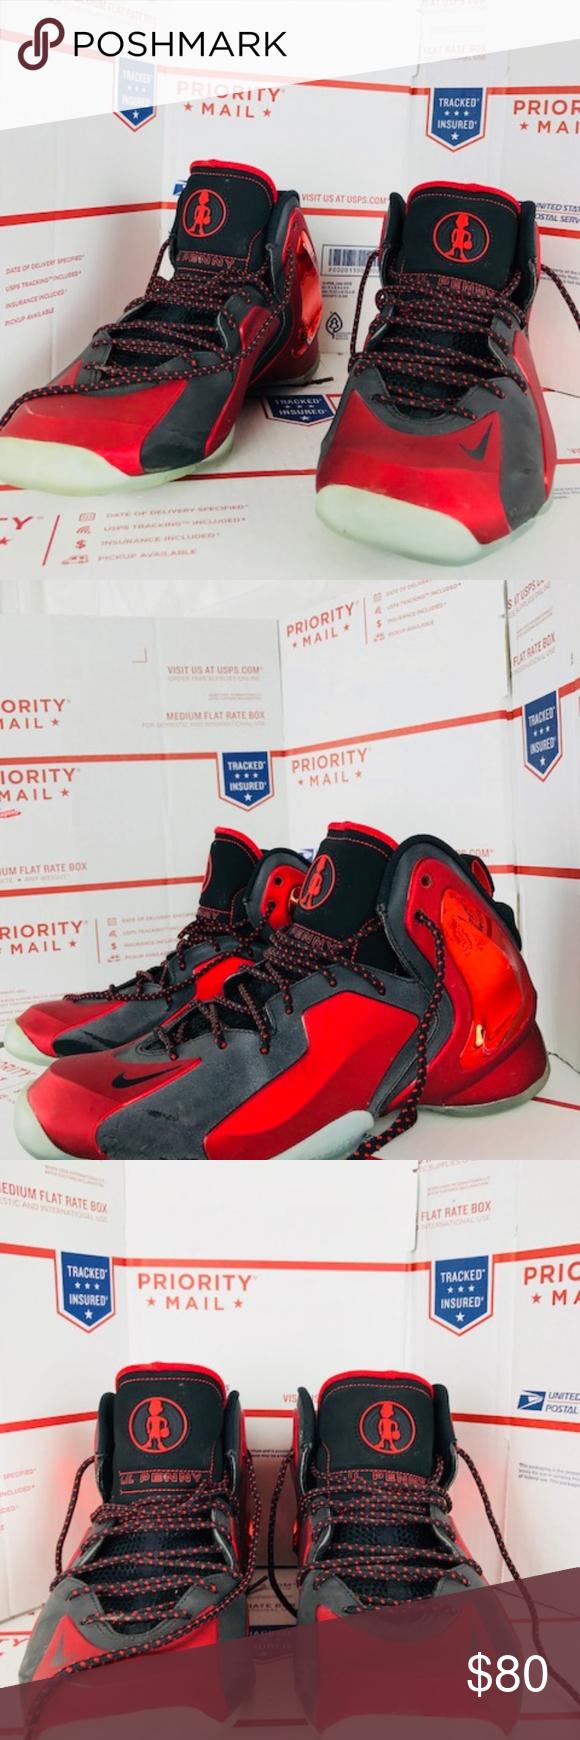 54696aaff42 Nike Lil Penny Posite University 630999 600 Sz 9.5 Used Men Nike Lil Penny  Posite University 630999 600 Red Black Basketball Sz 9.5 Nike Shoes  Athletic ...